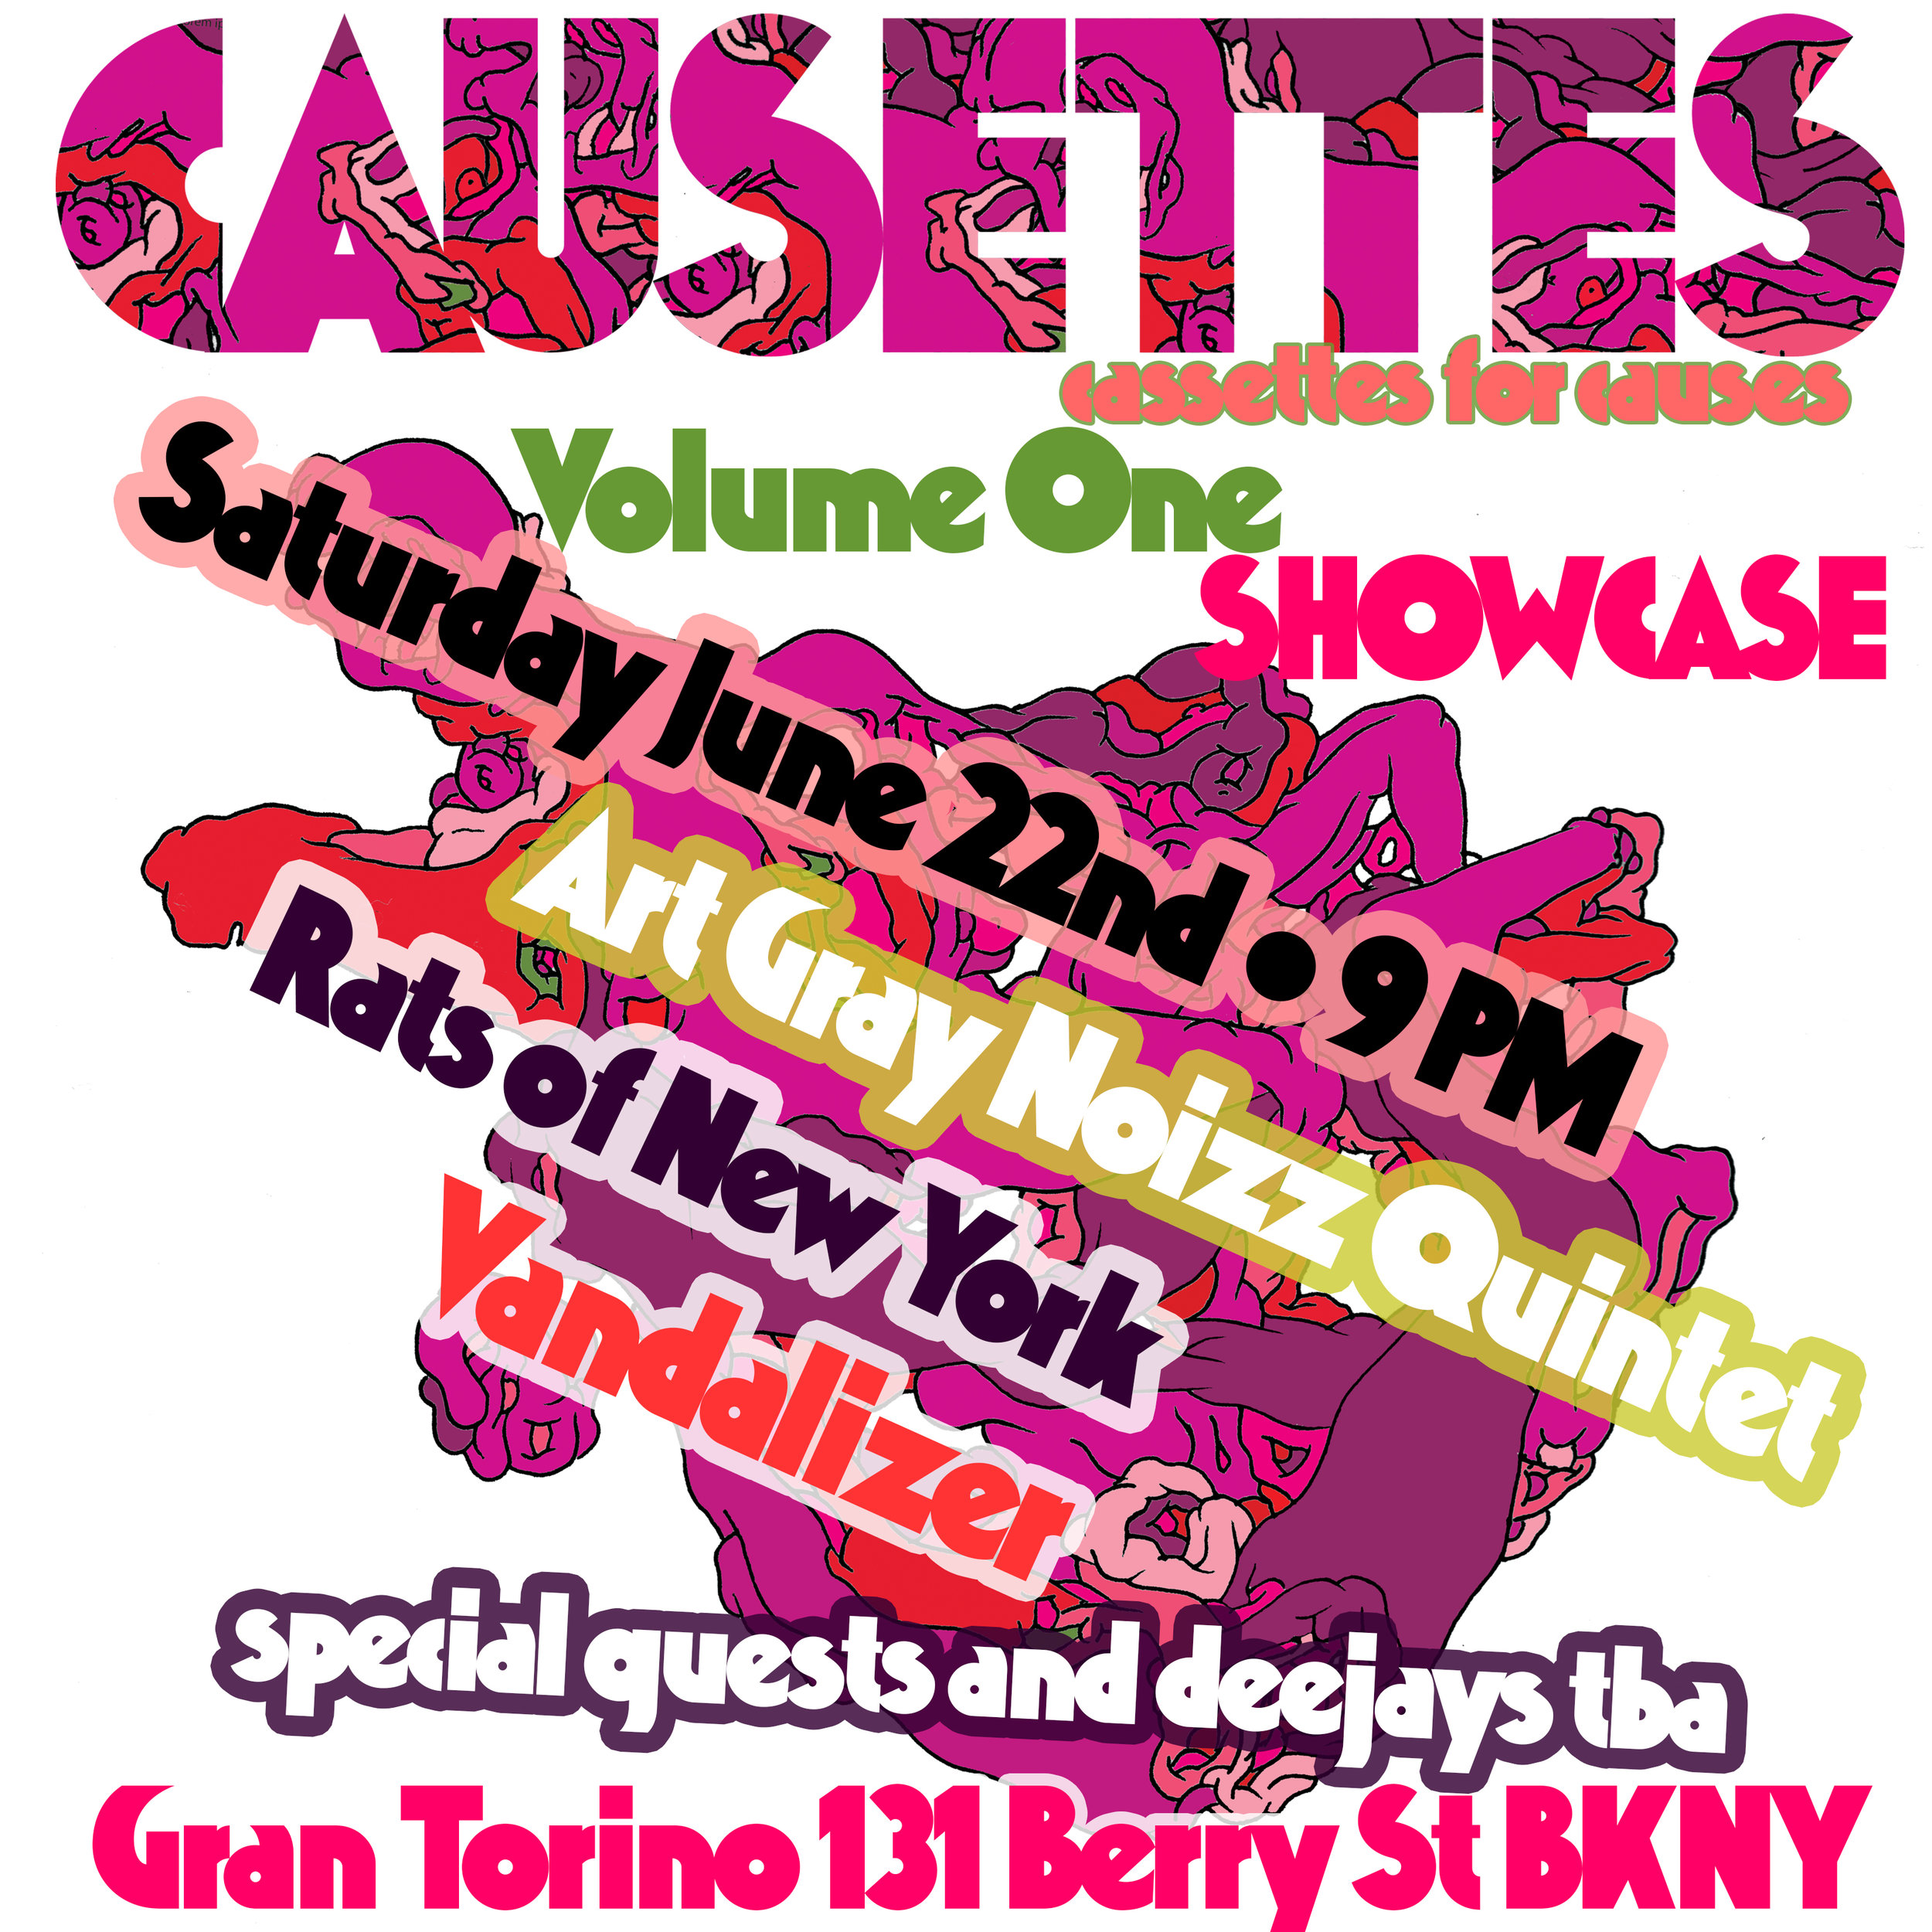 causettes_showcase1_ig.jpg